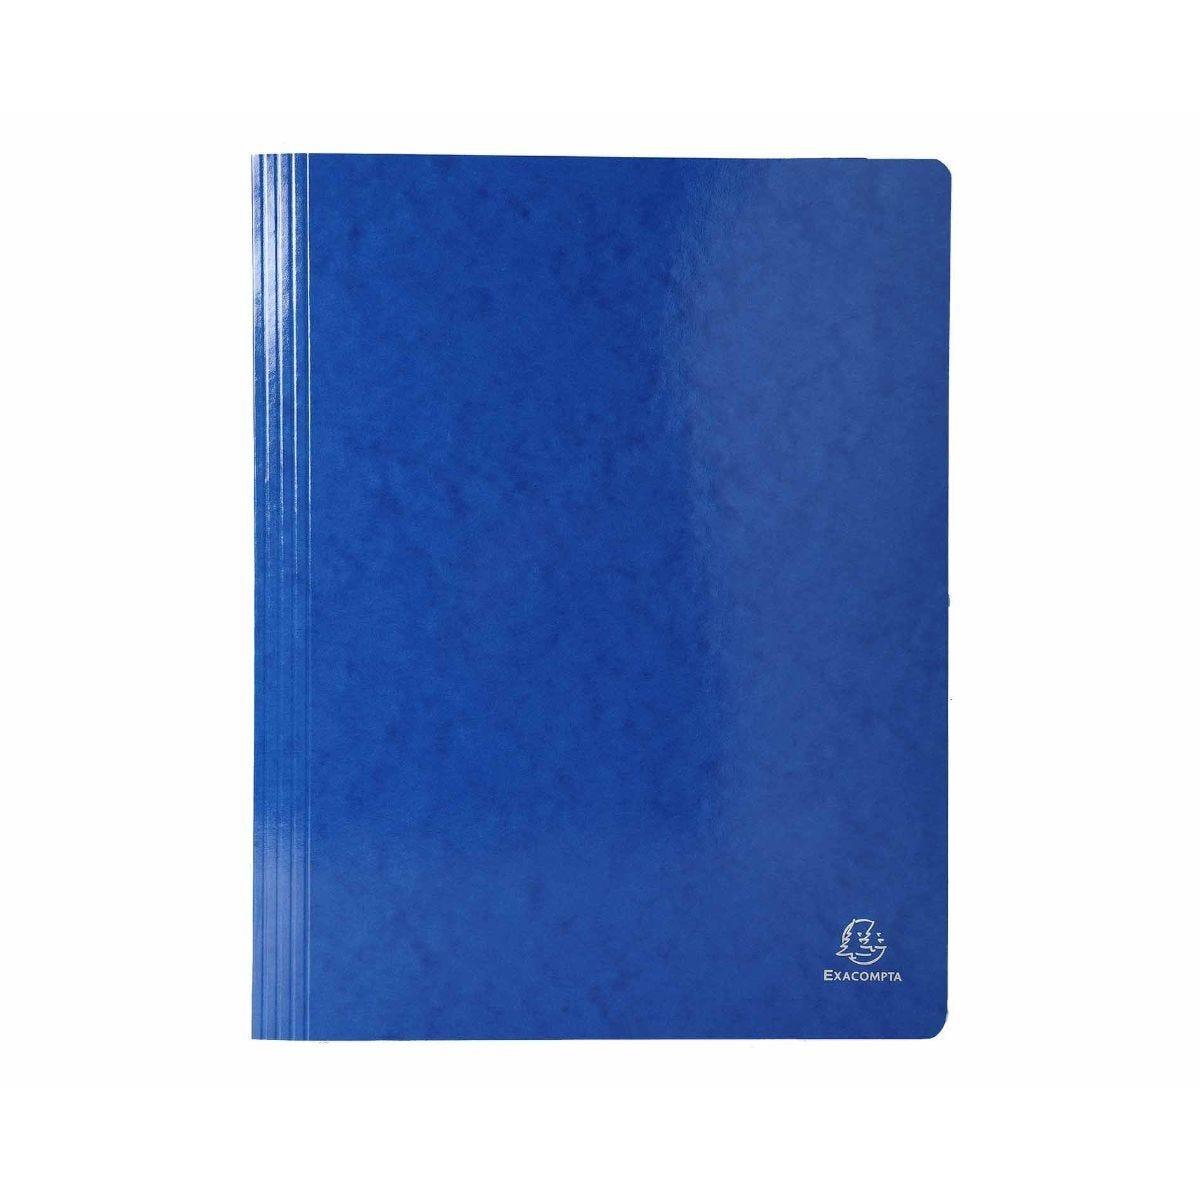 Exacompta Iderama Flat Bar Files Flat A4 Pack of 25 355gsm Blue